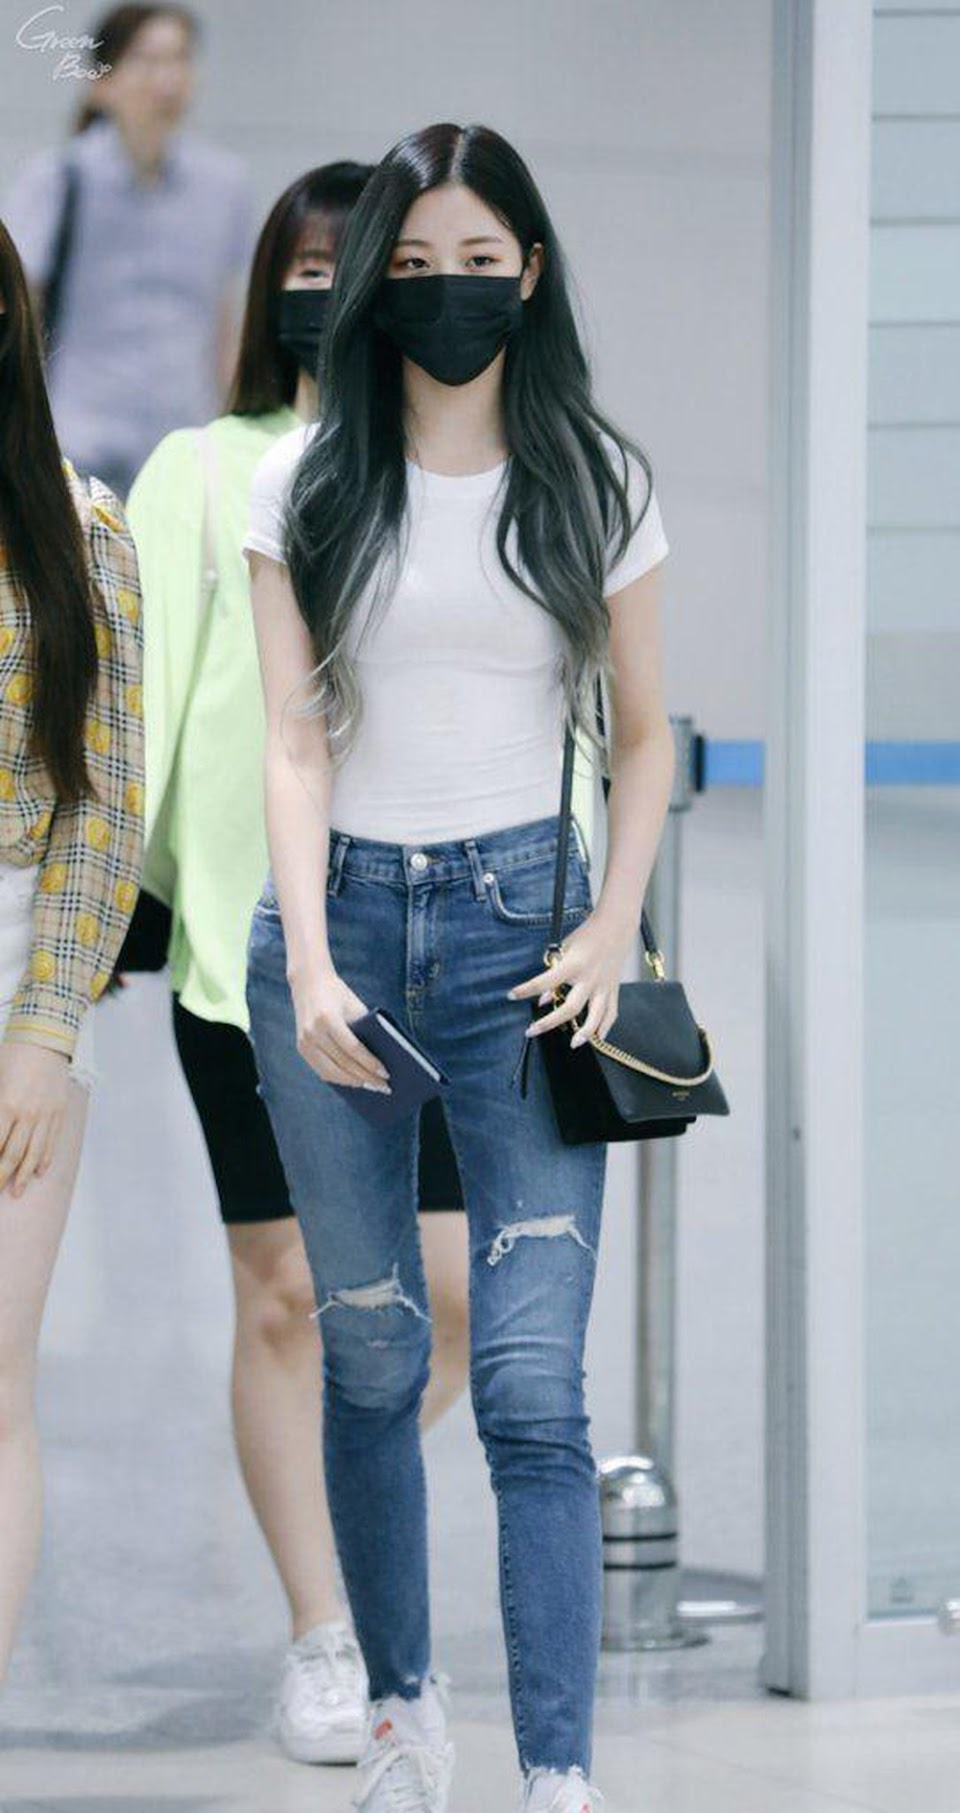 jang wonyoung izone3